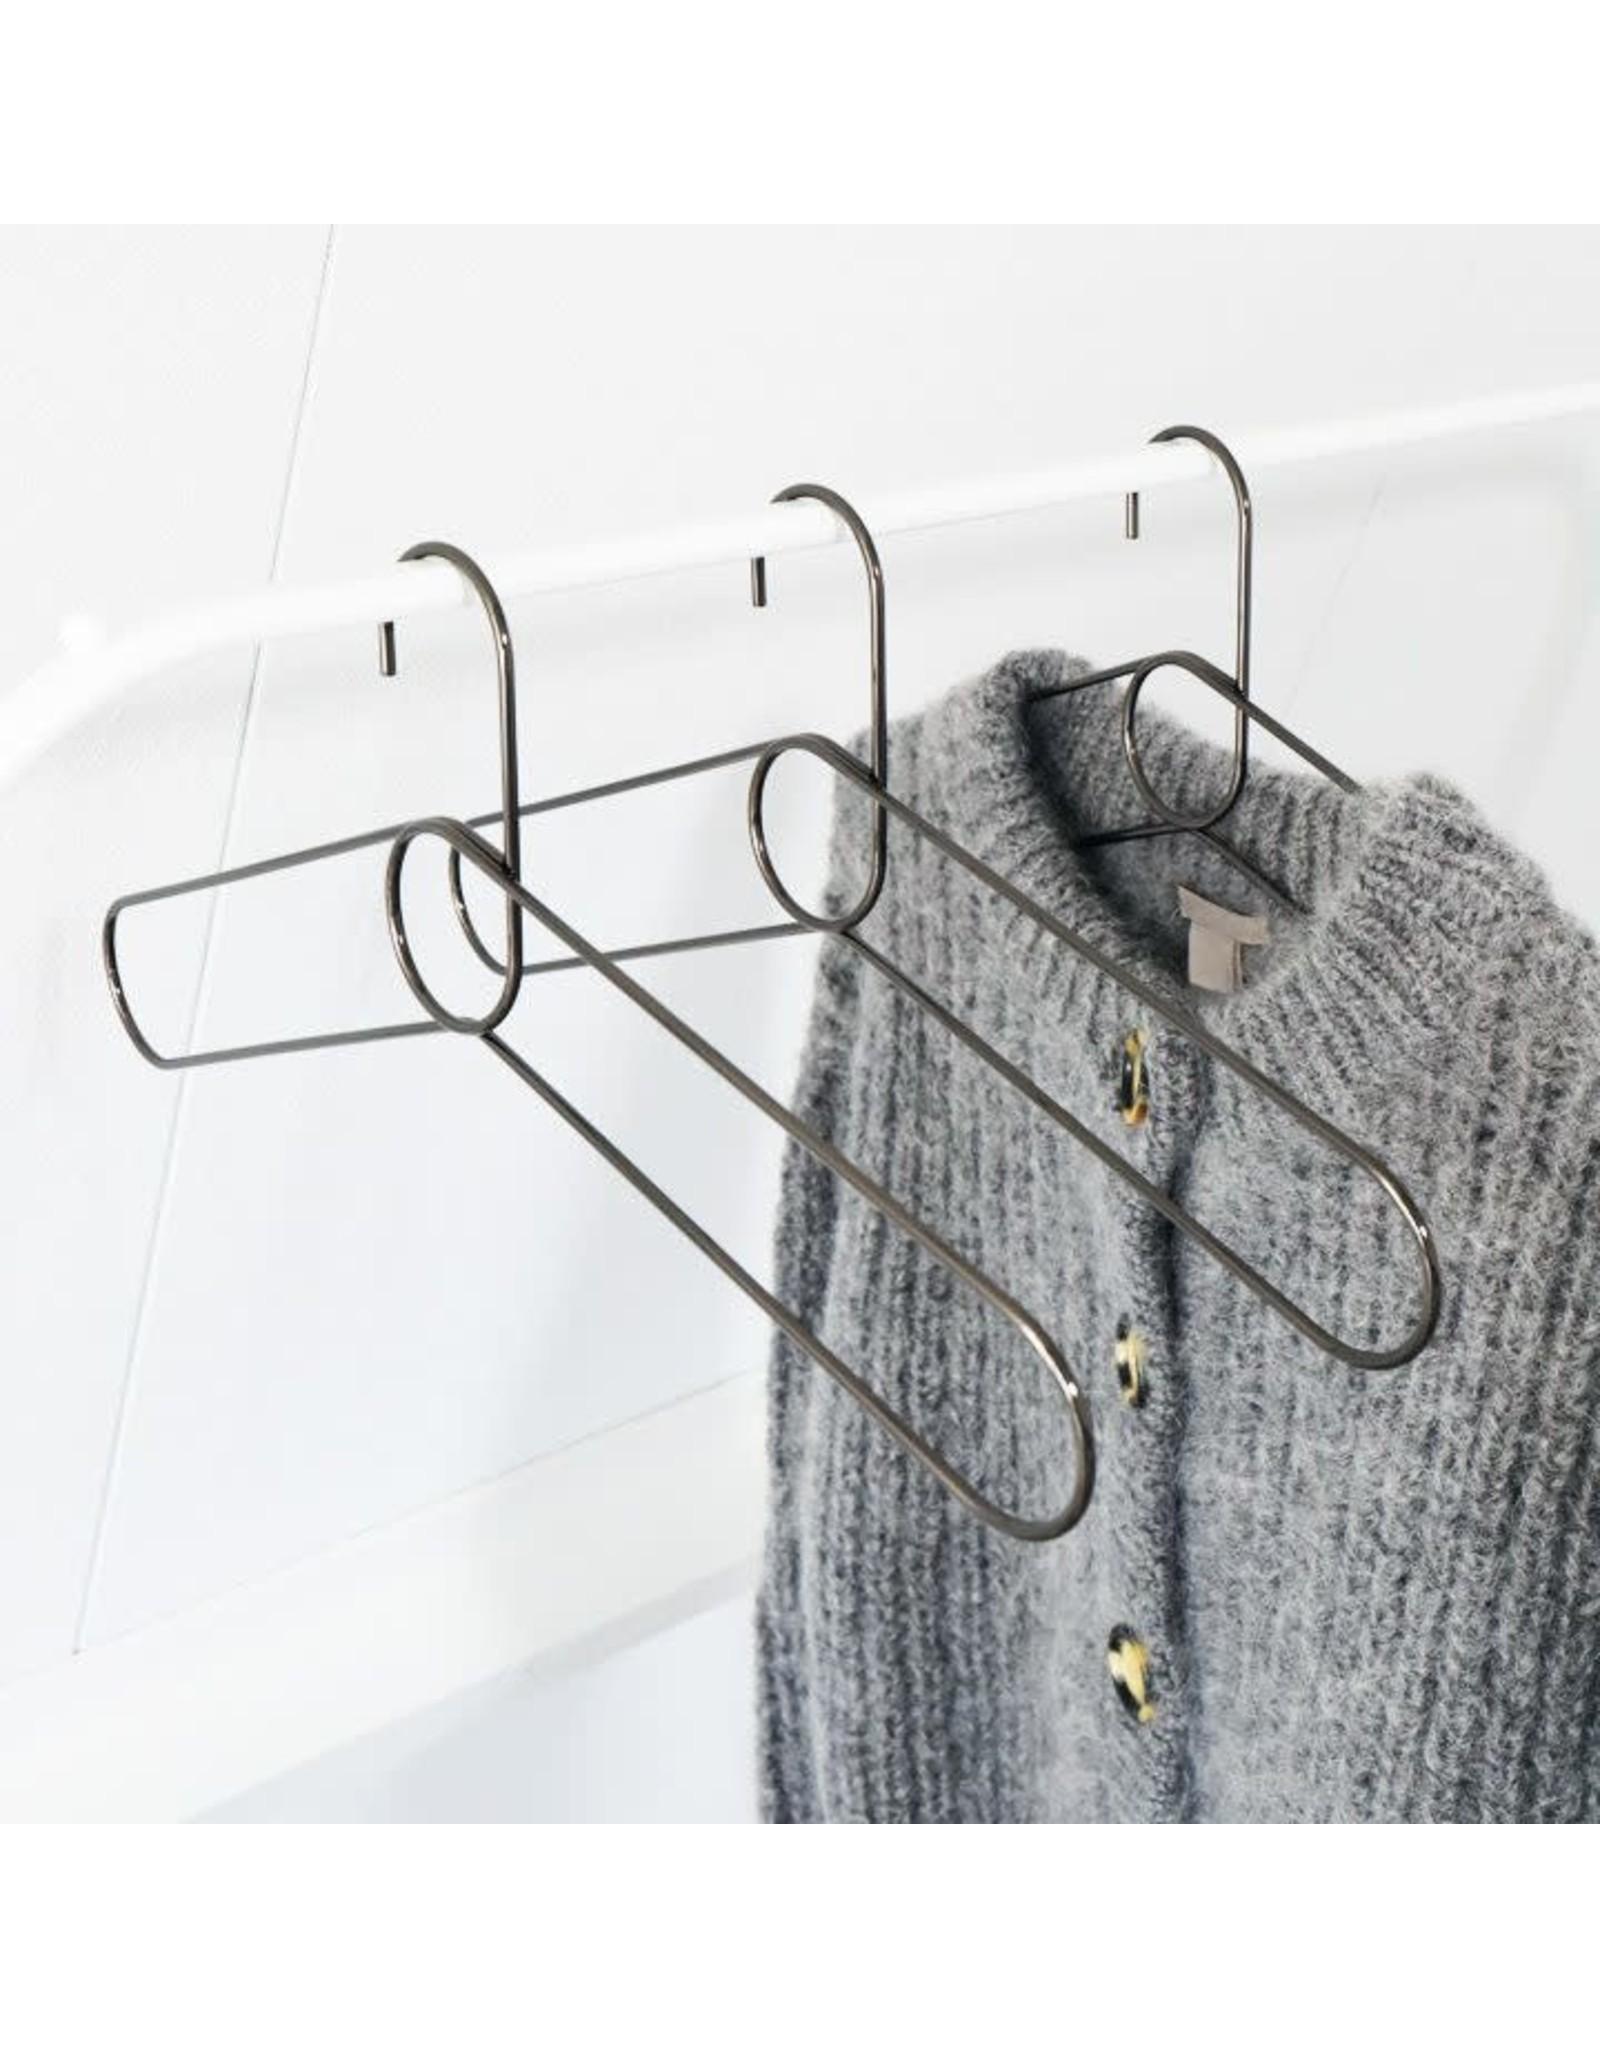 PUIK design PUIK - LOOP kledinghanger (3stuks)